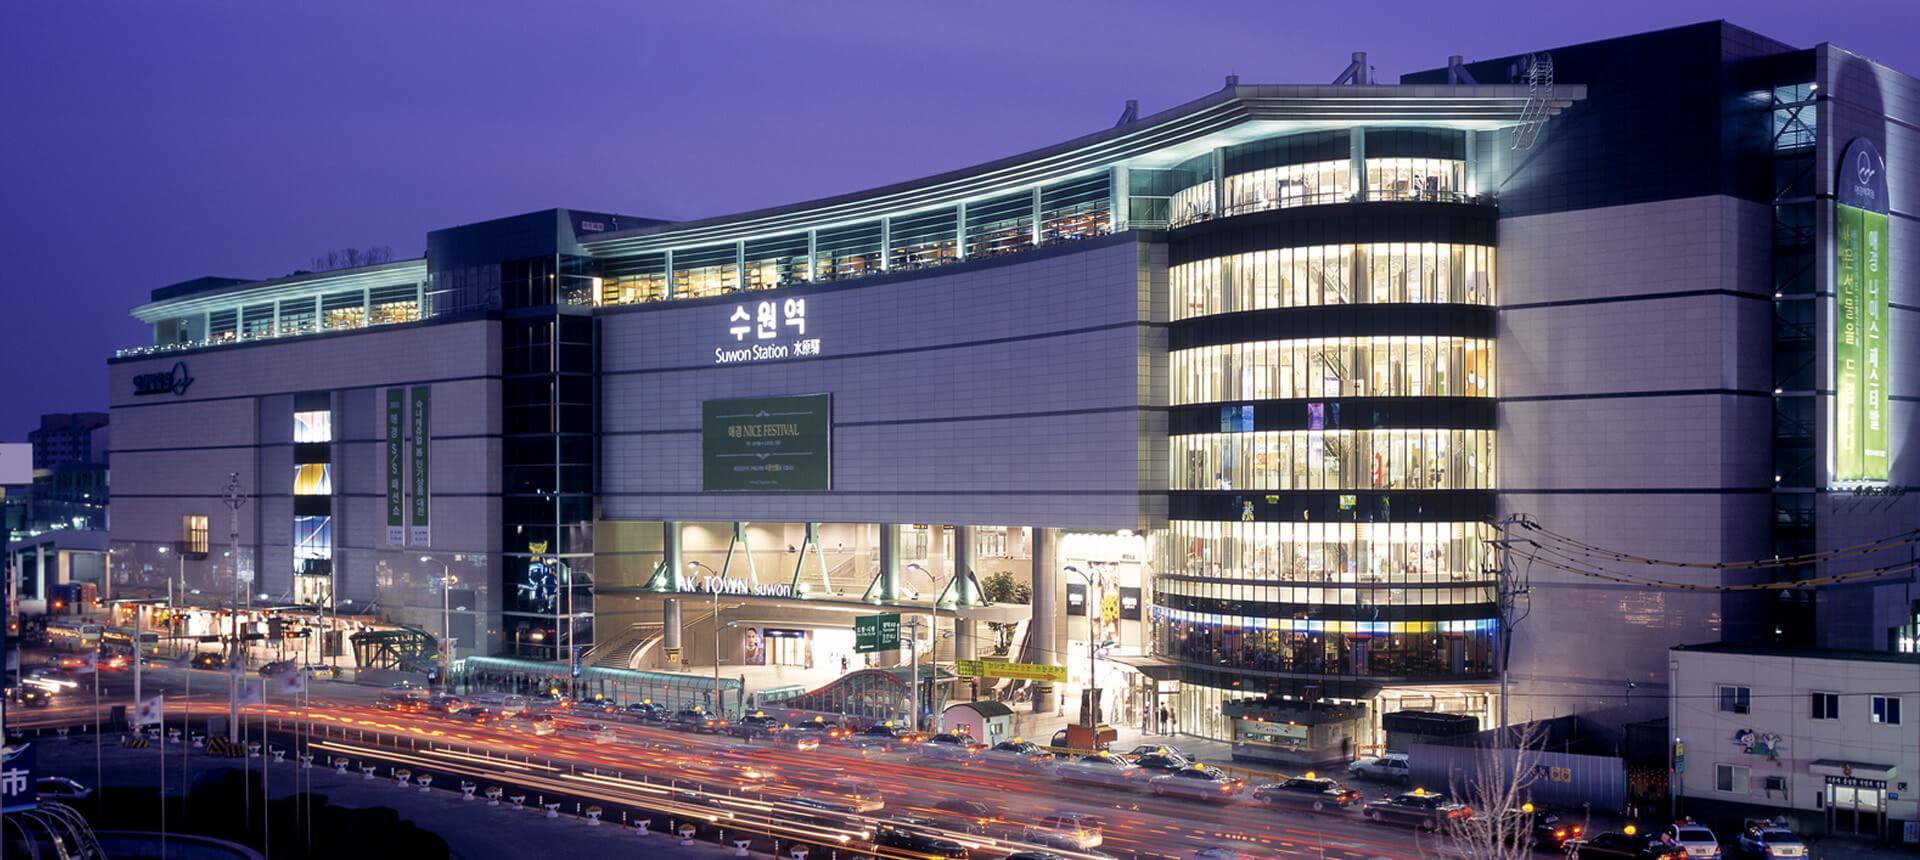 Aloft Seoul Myeongdong - TripAdvisor